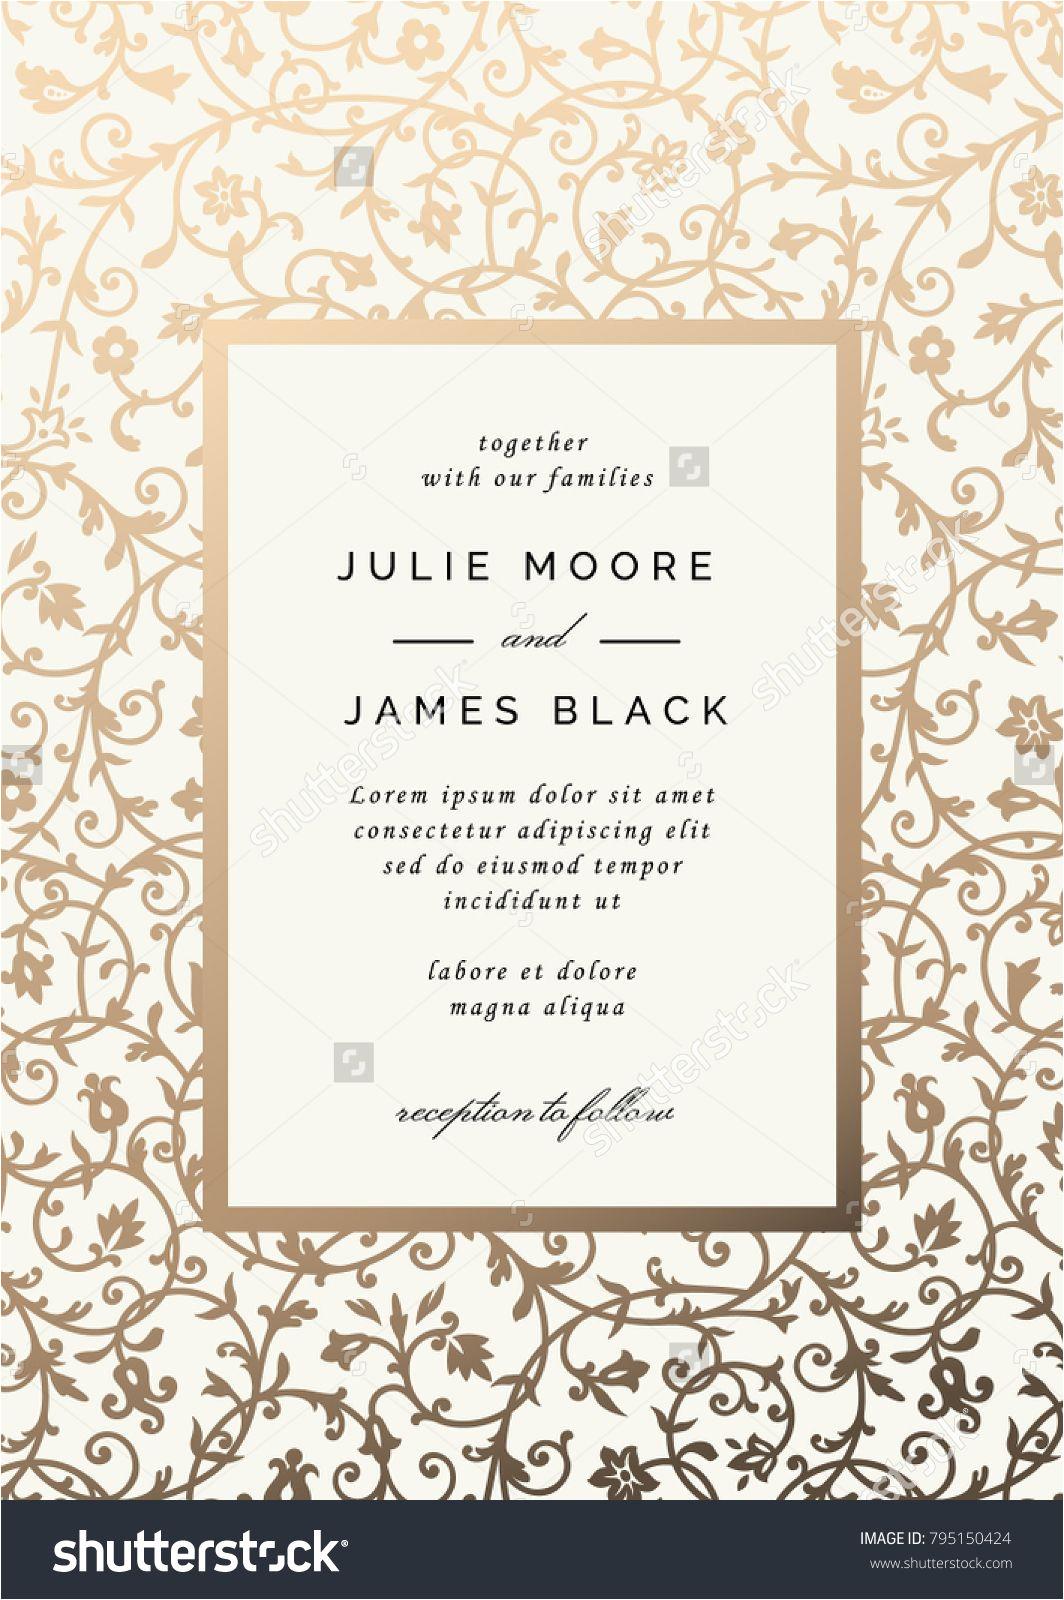 Card Design for Wedding with Price Vintage Wedding Invitation Template with Golden Floral Backg